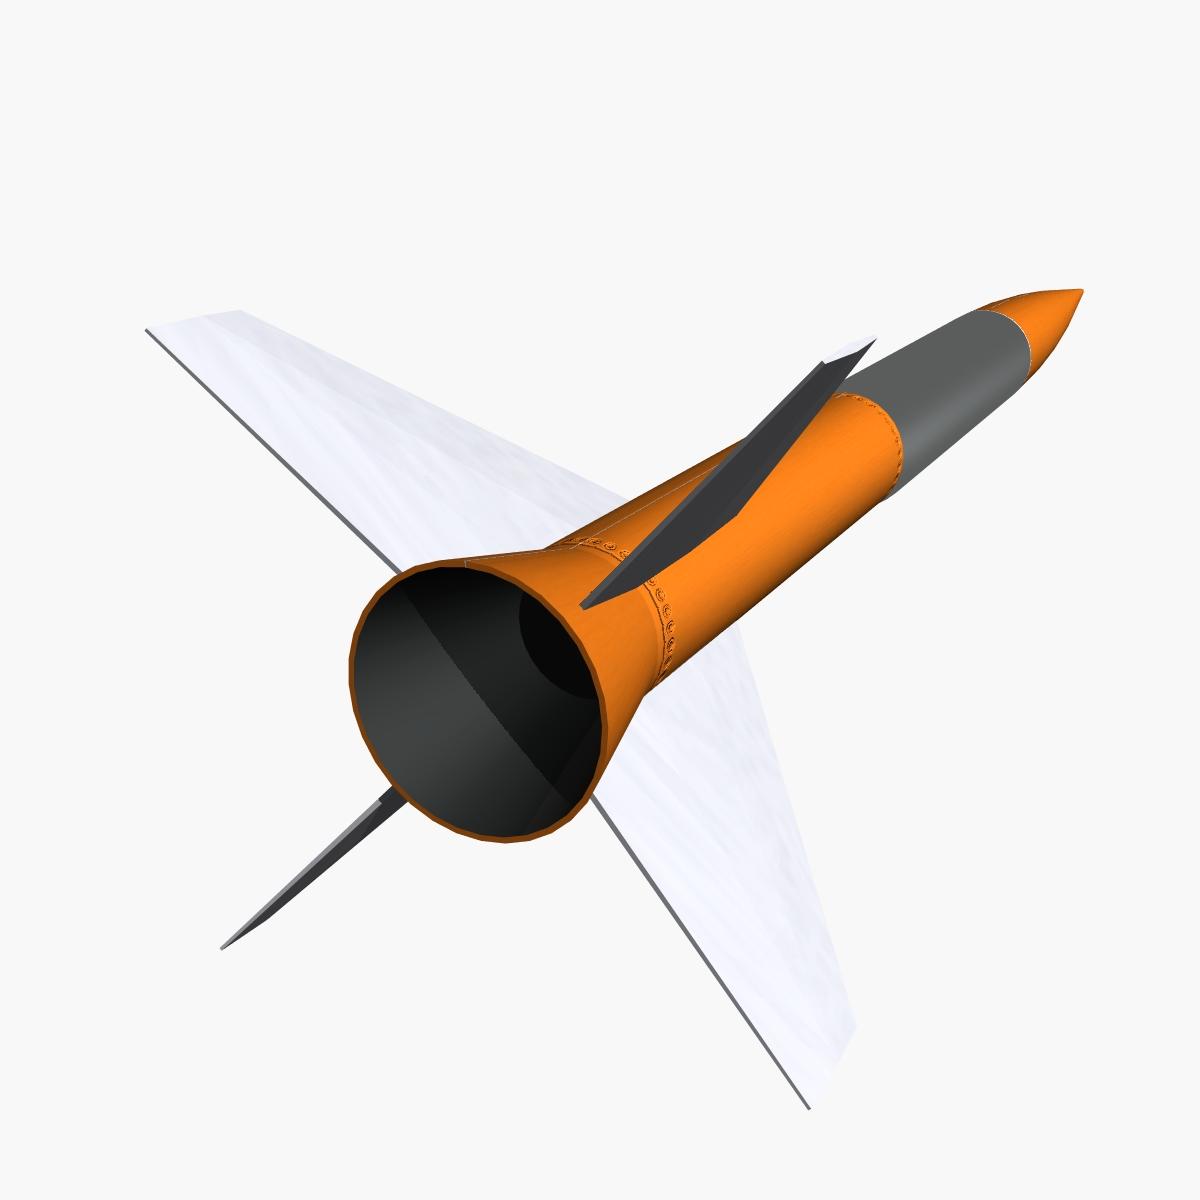 gamma centauro rocket 3d model 3ds dxf fbx blend cob dae x obj 218204